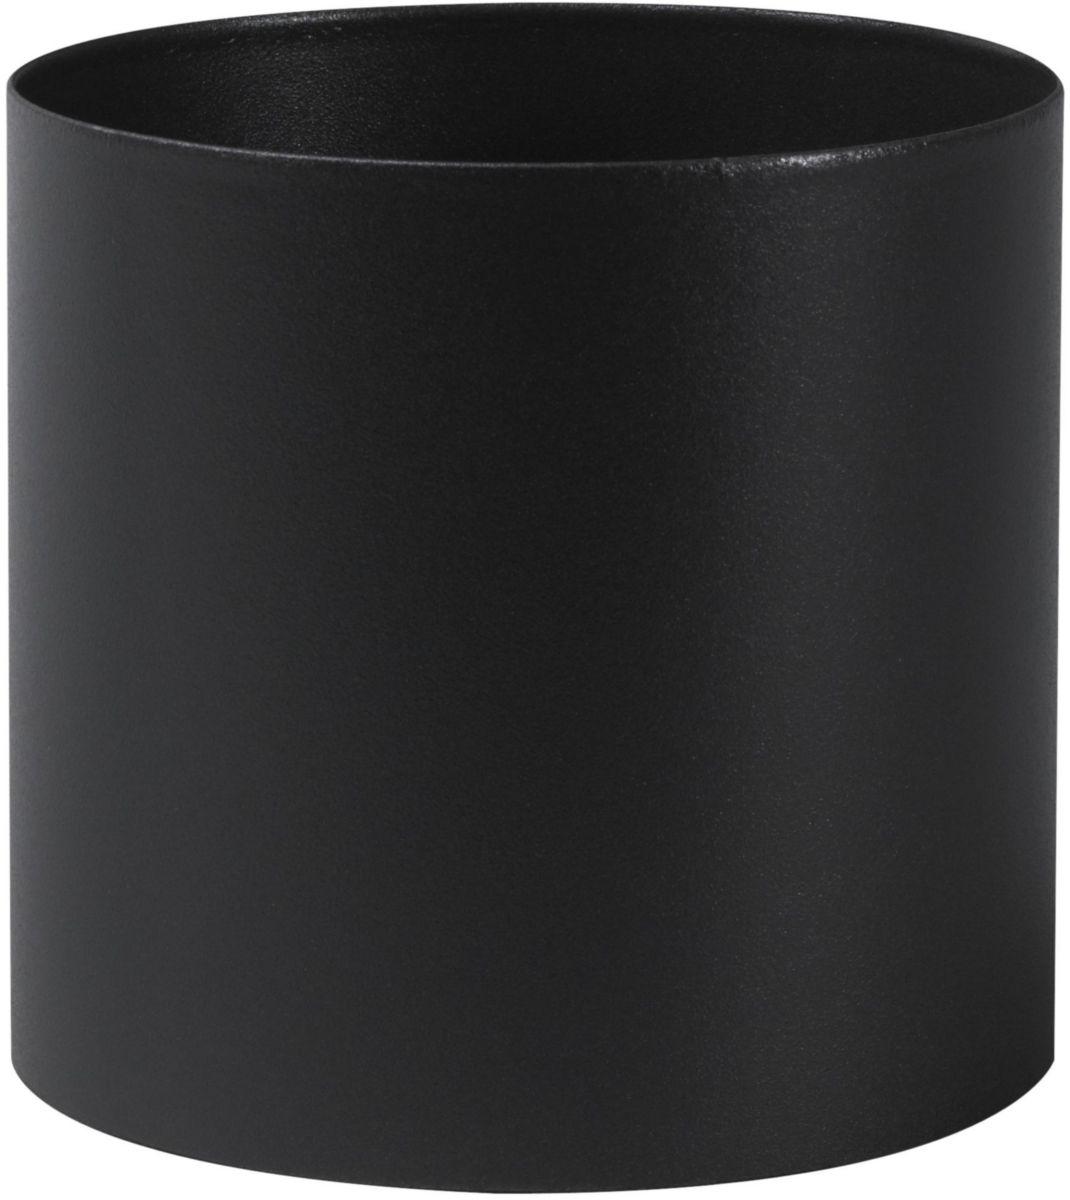 Tuyau rigide email noir raccord noir mat 12 cm d 153 réf. 344126